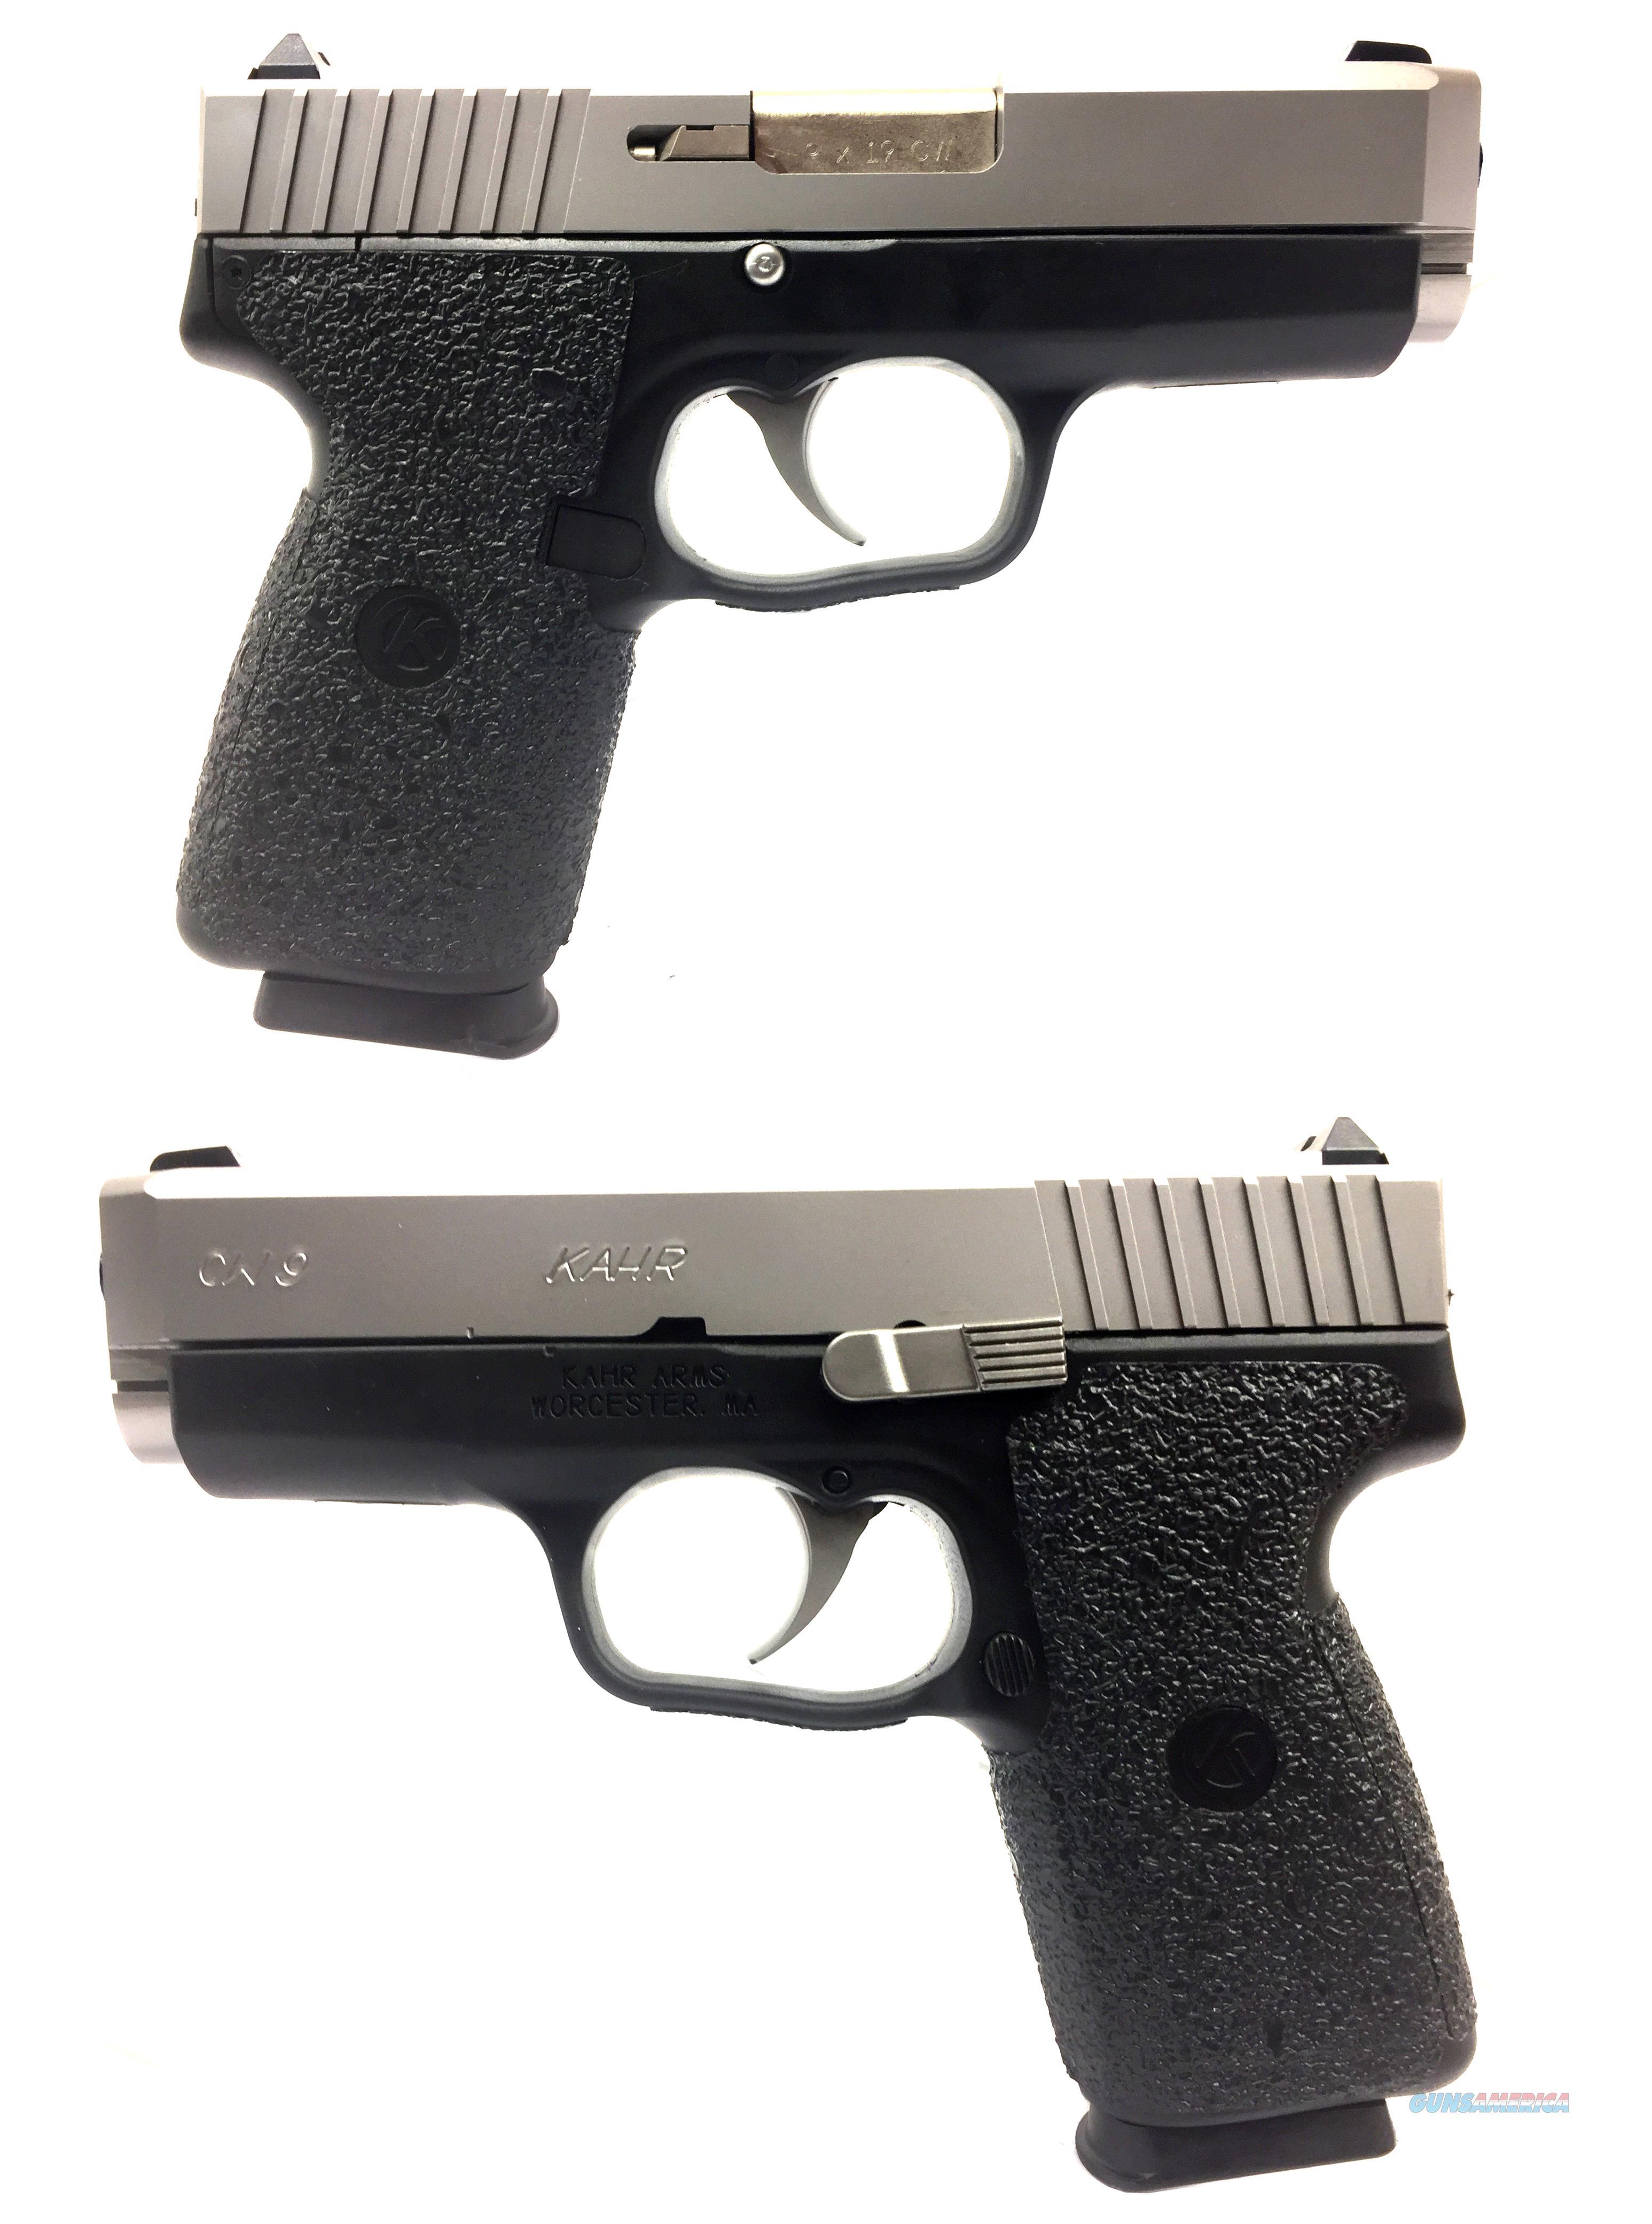 Kahr CW9 Semi-Automatic Pistol  Guns > Pistols > Kahr Pistols